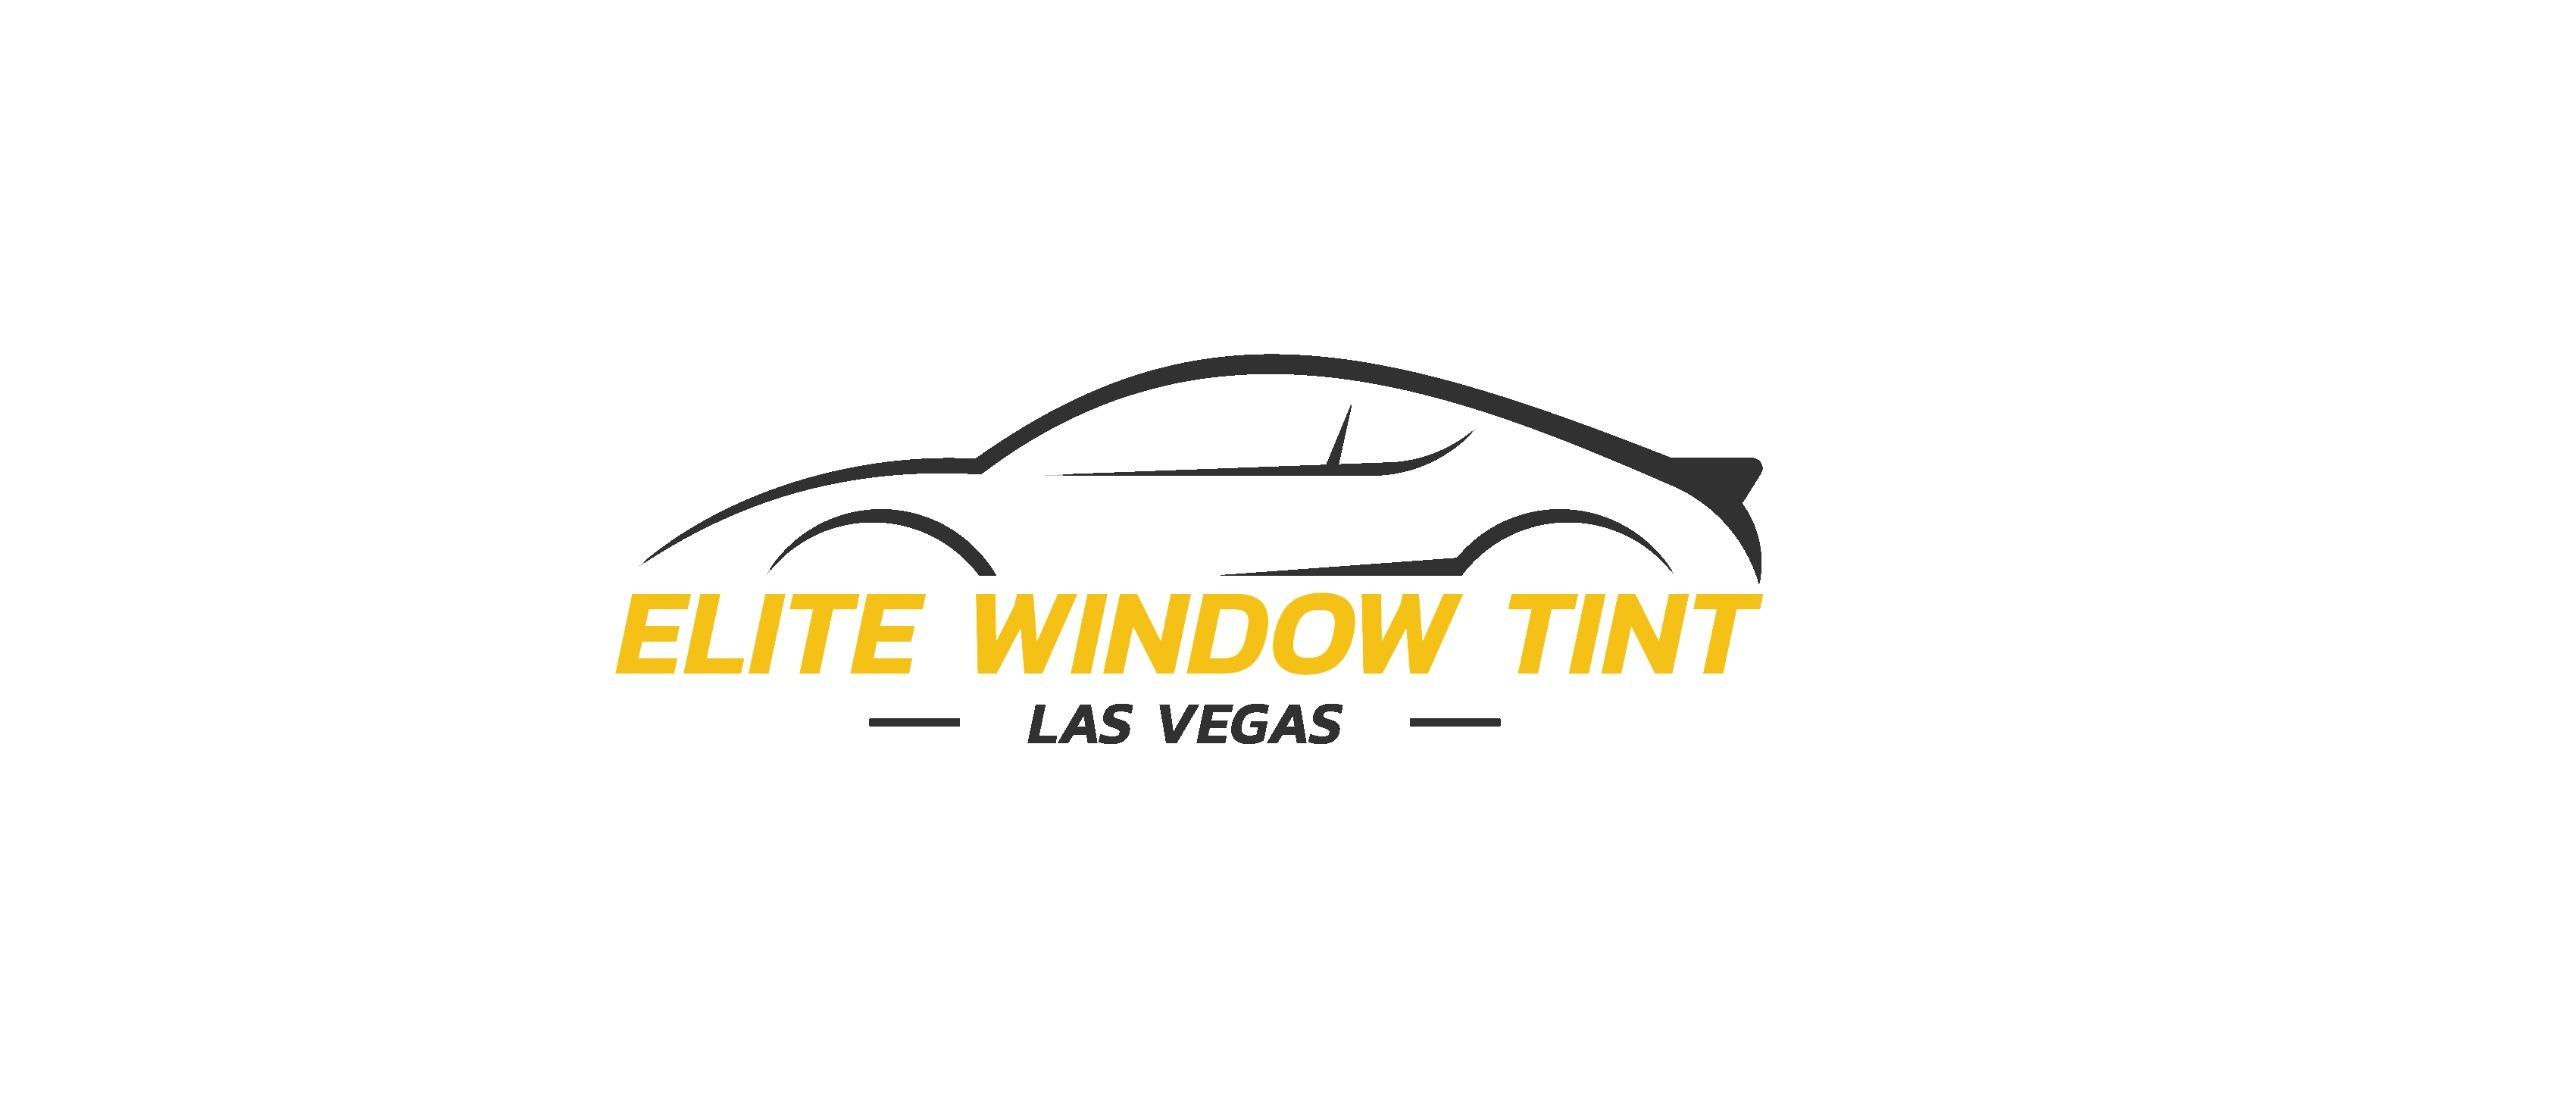 Elite Window Tint Las Vegas (@stehrbxyp43) Cover Image